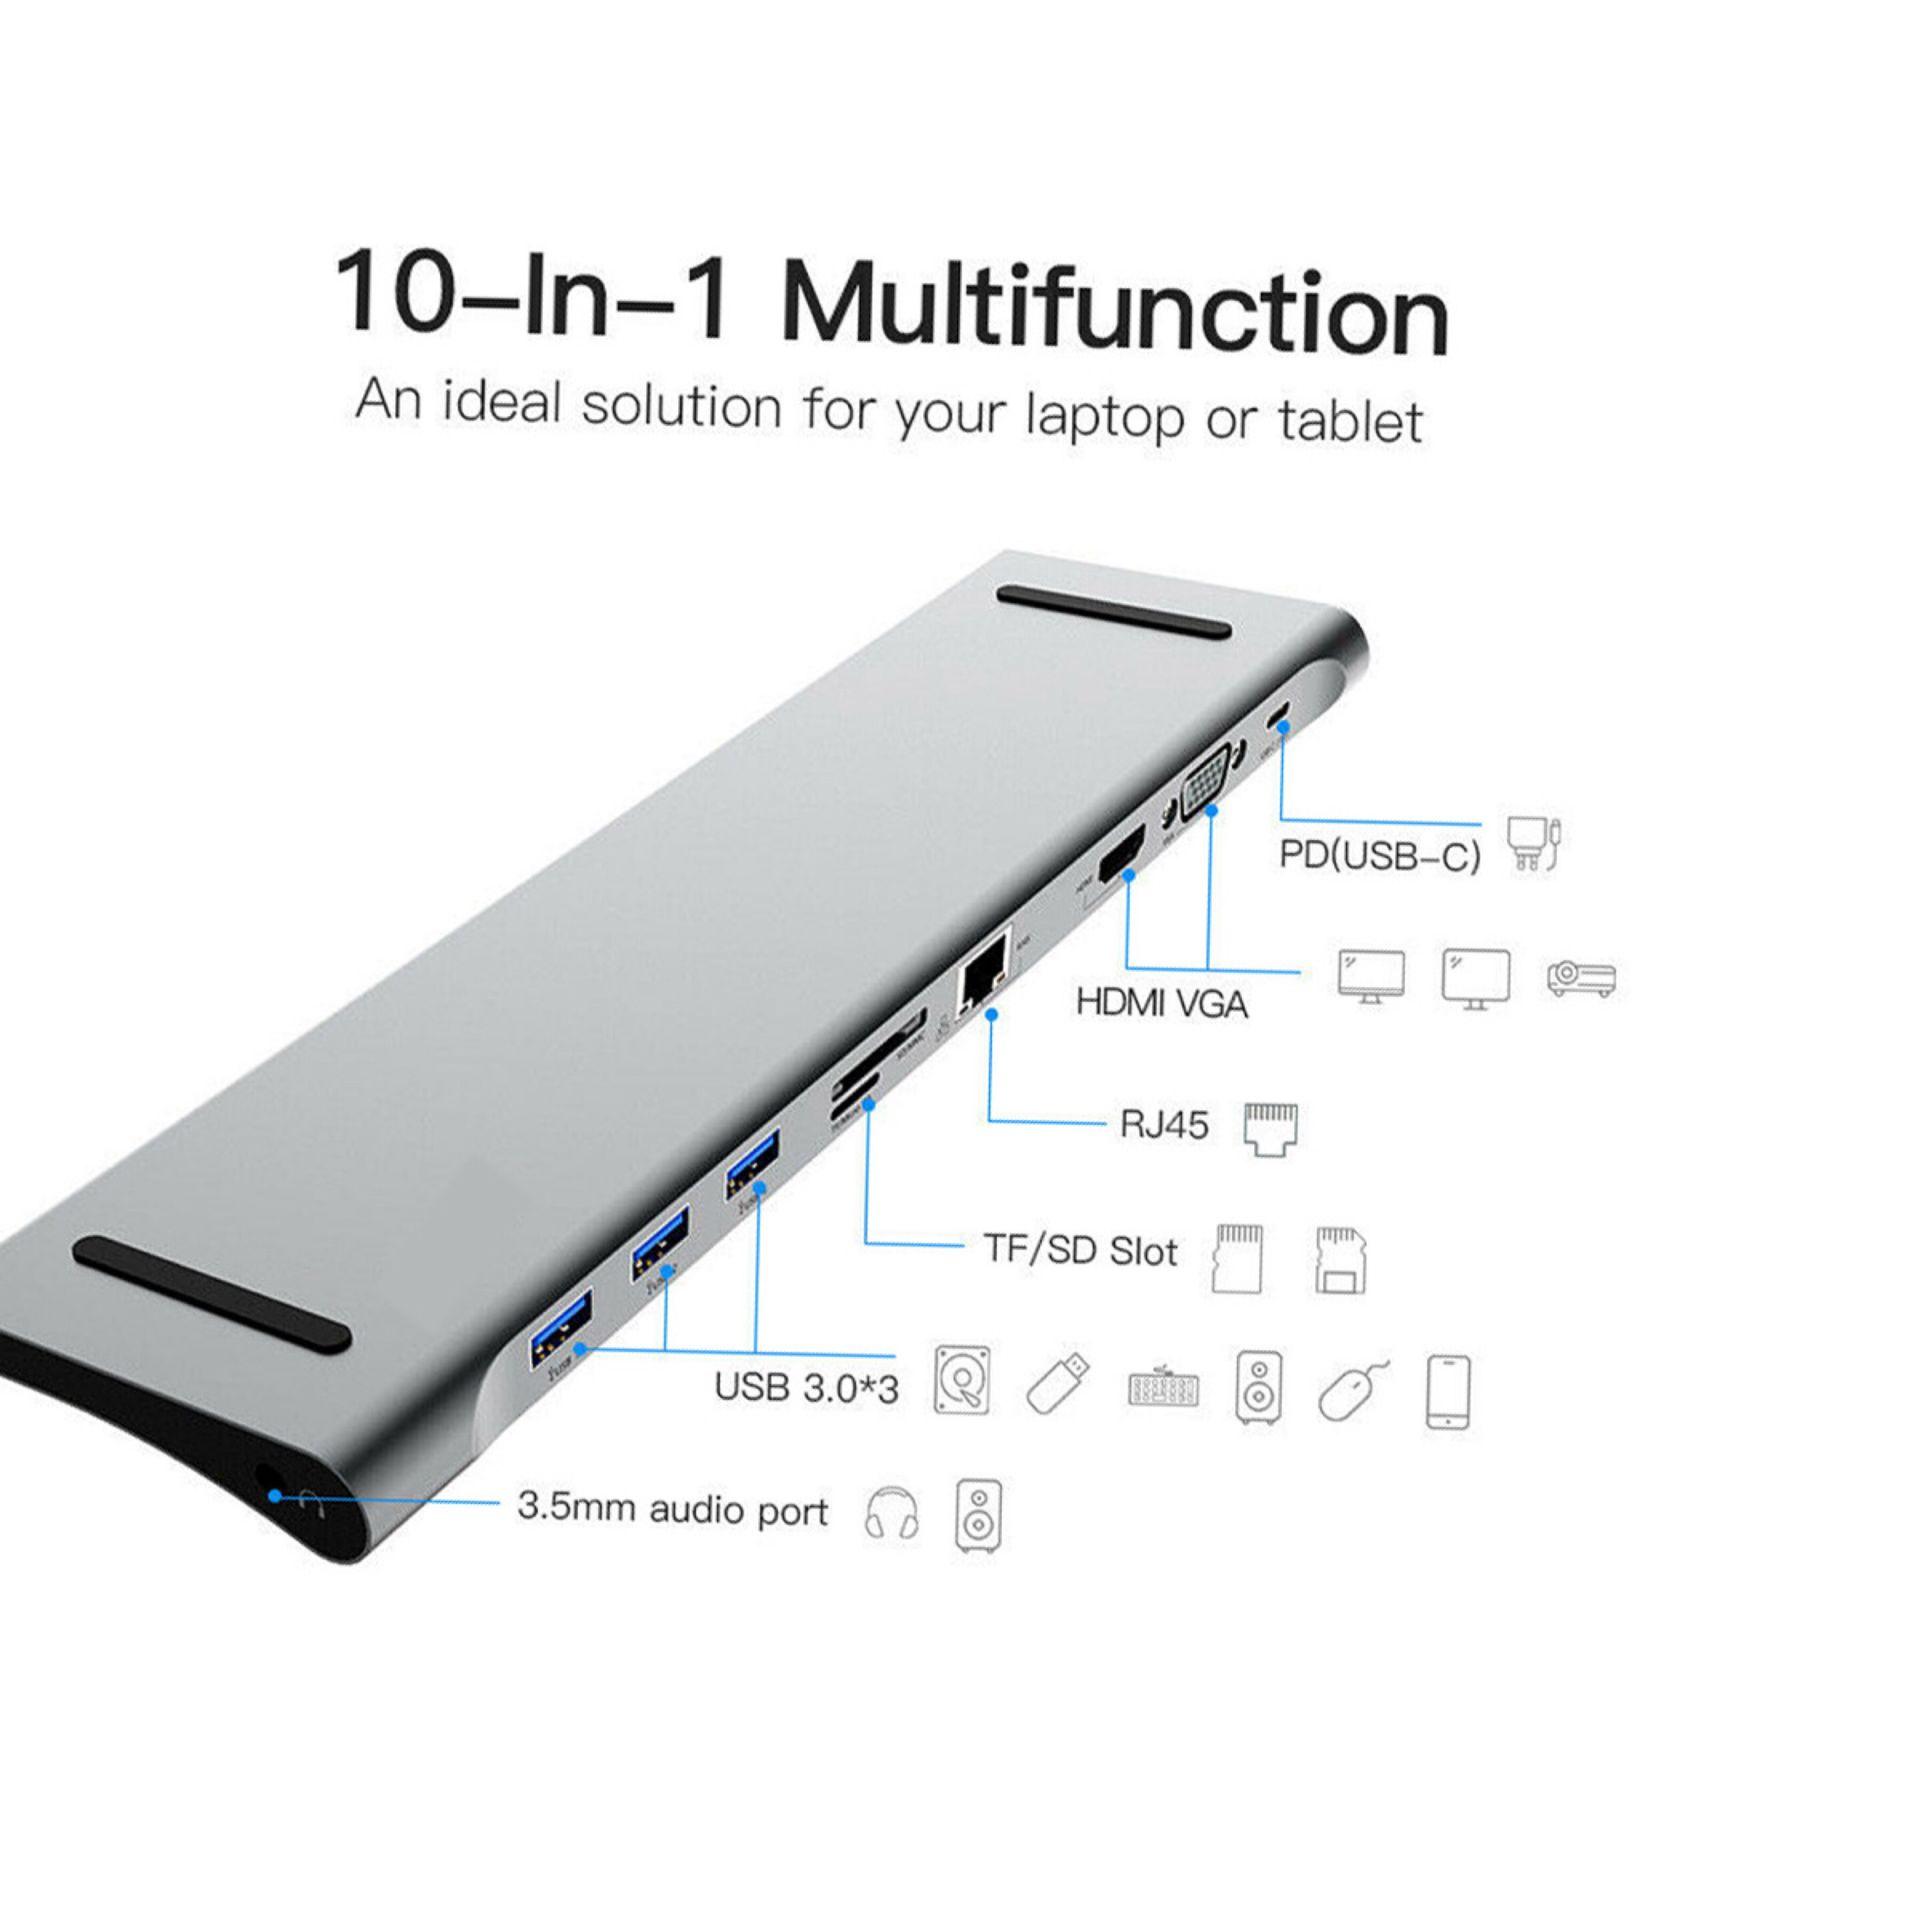 Dock Adapter for usbc hub type c HDMI USB3 0 RJ45 VGA PD chrage 3 5mm